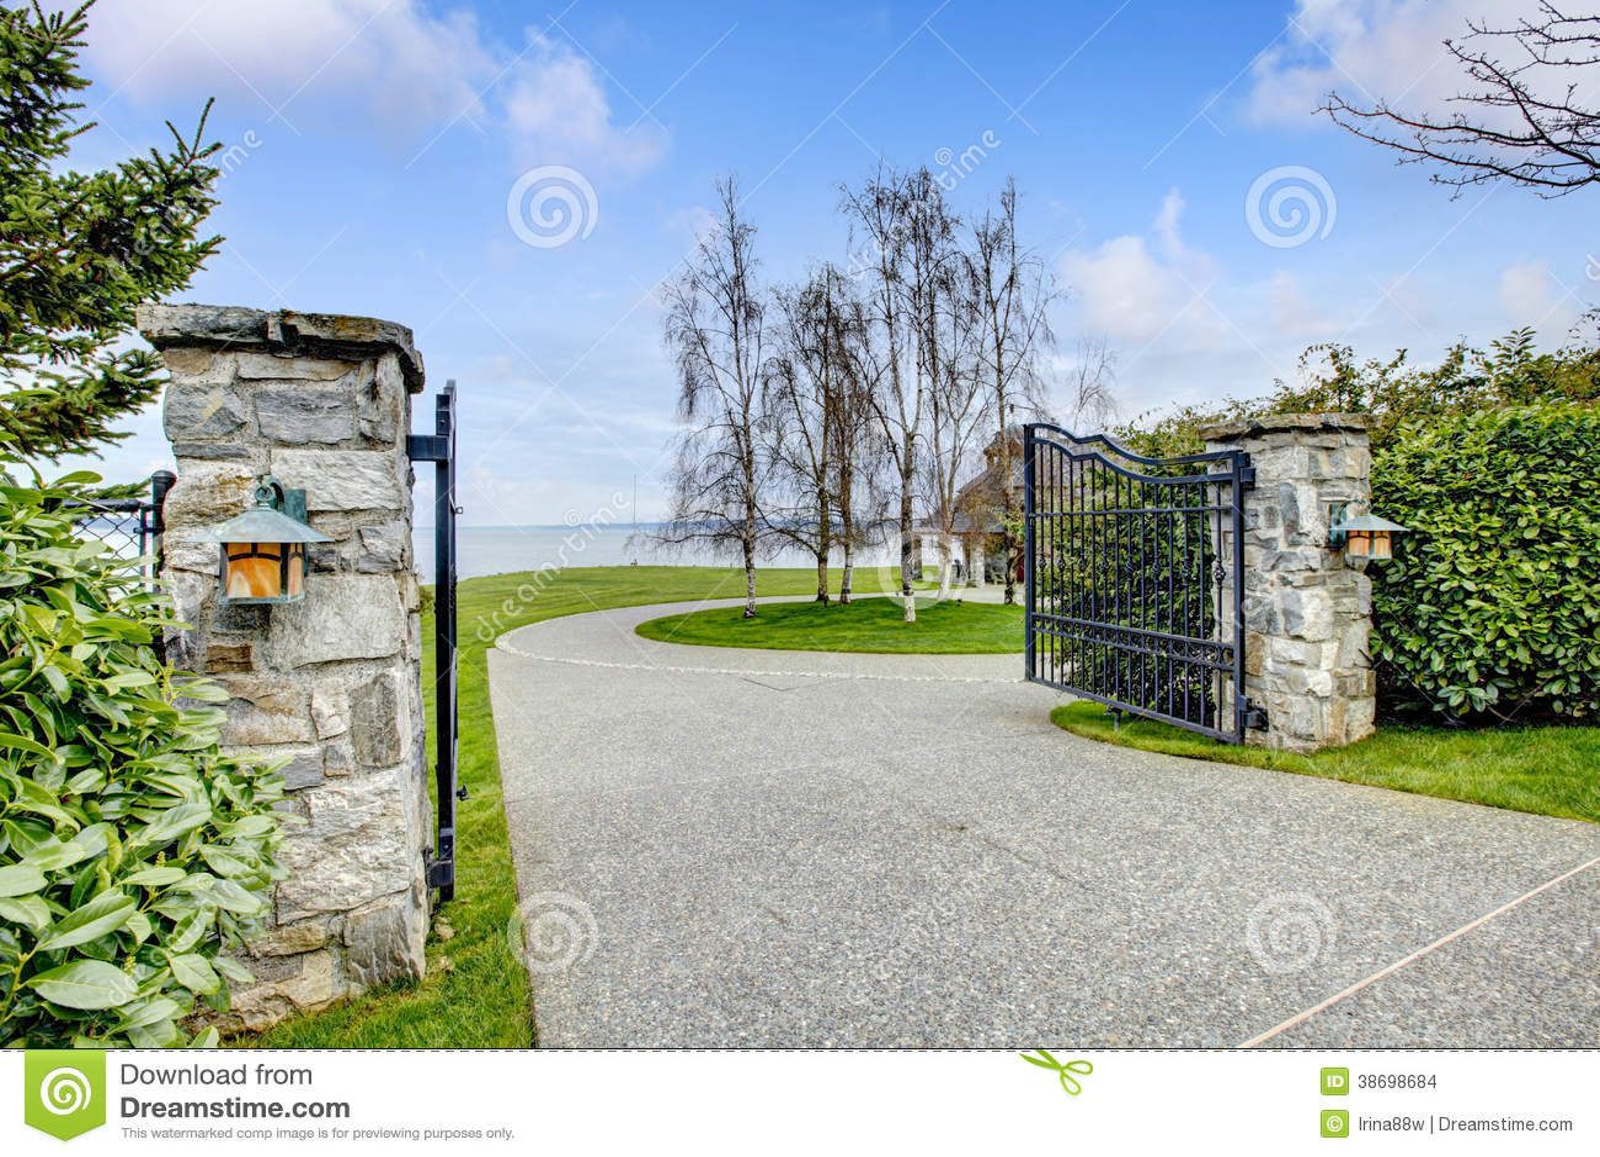 Entrance Iron Gates With Stone Columns Stock Images